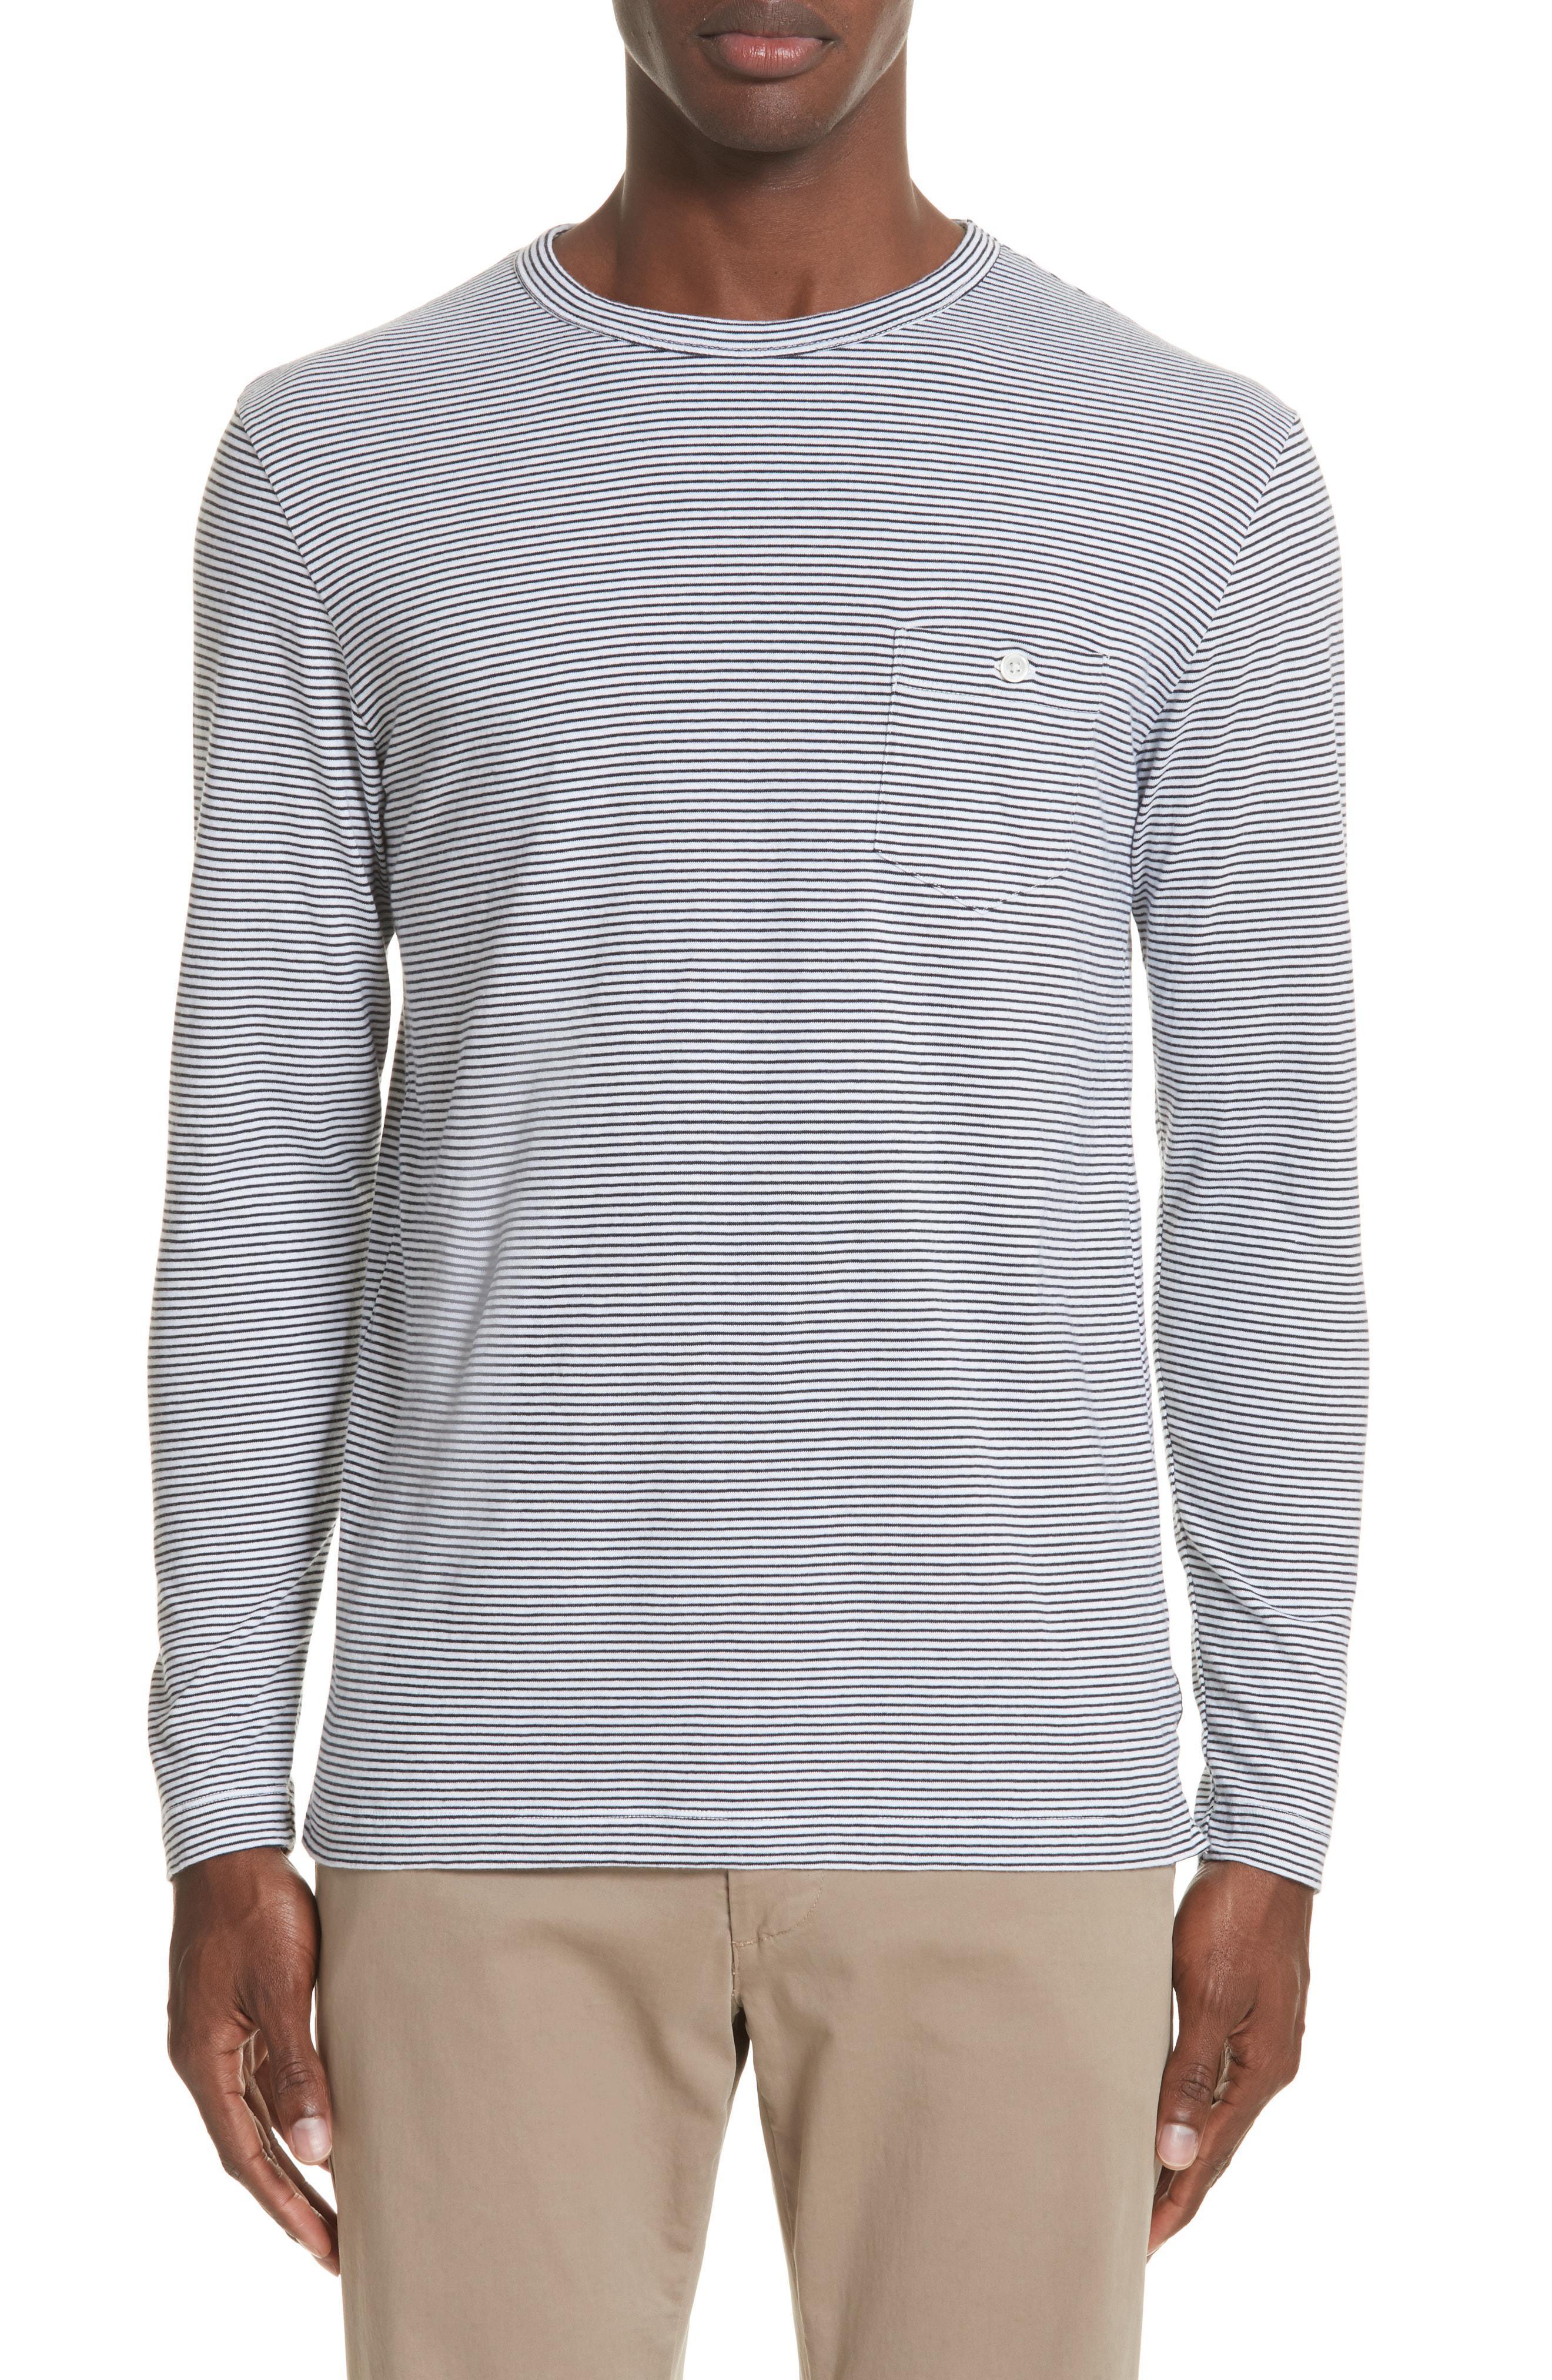 21894173 Lyst - Todd Snyder Stripe Long Sleeve T-shirt in Gray for Men